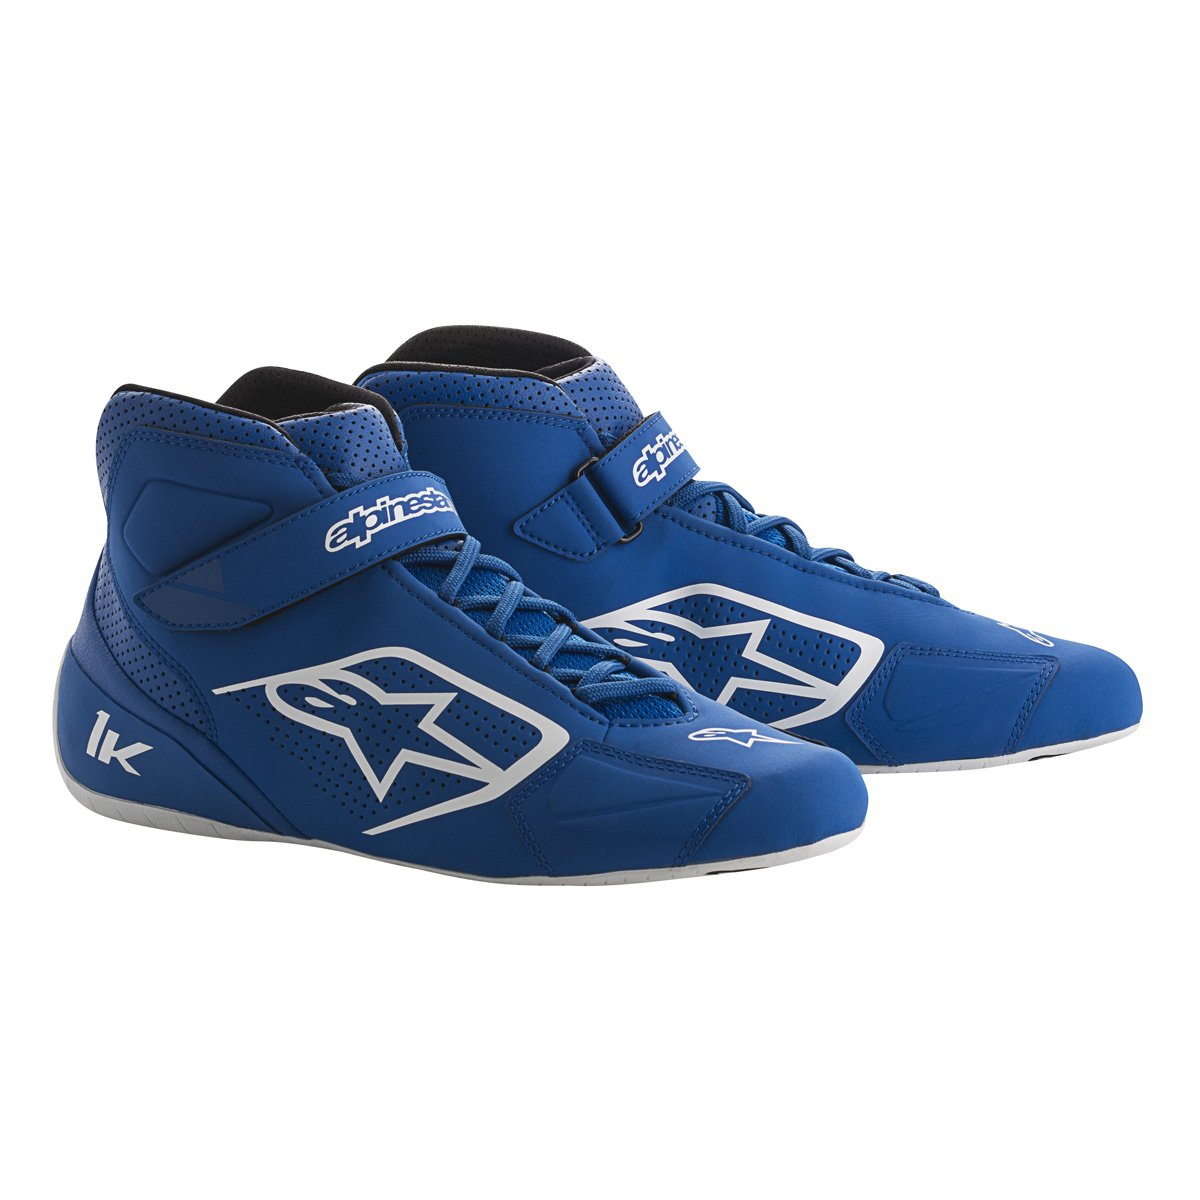 Alpinestars 2712018-72B-12 Tech 1-K Shoes, Blue/Black/White, Size 12